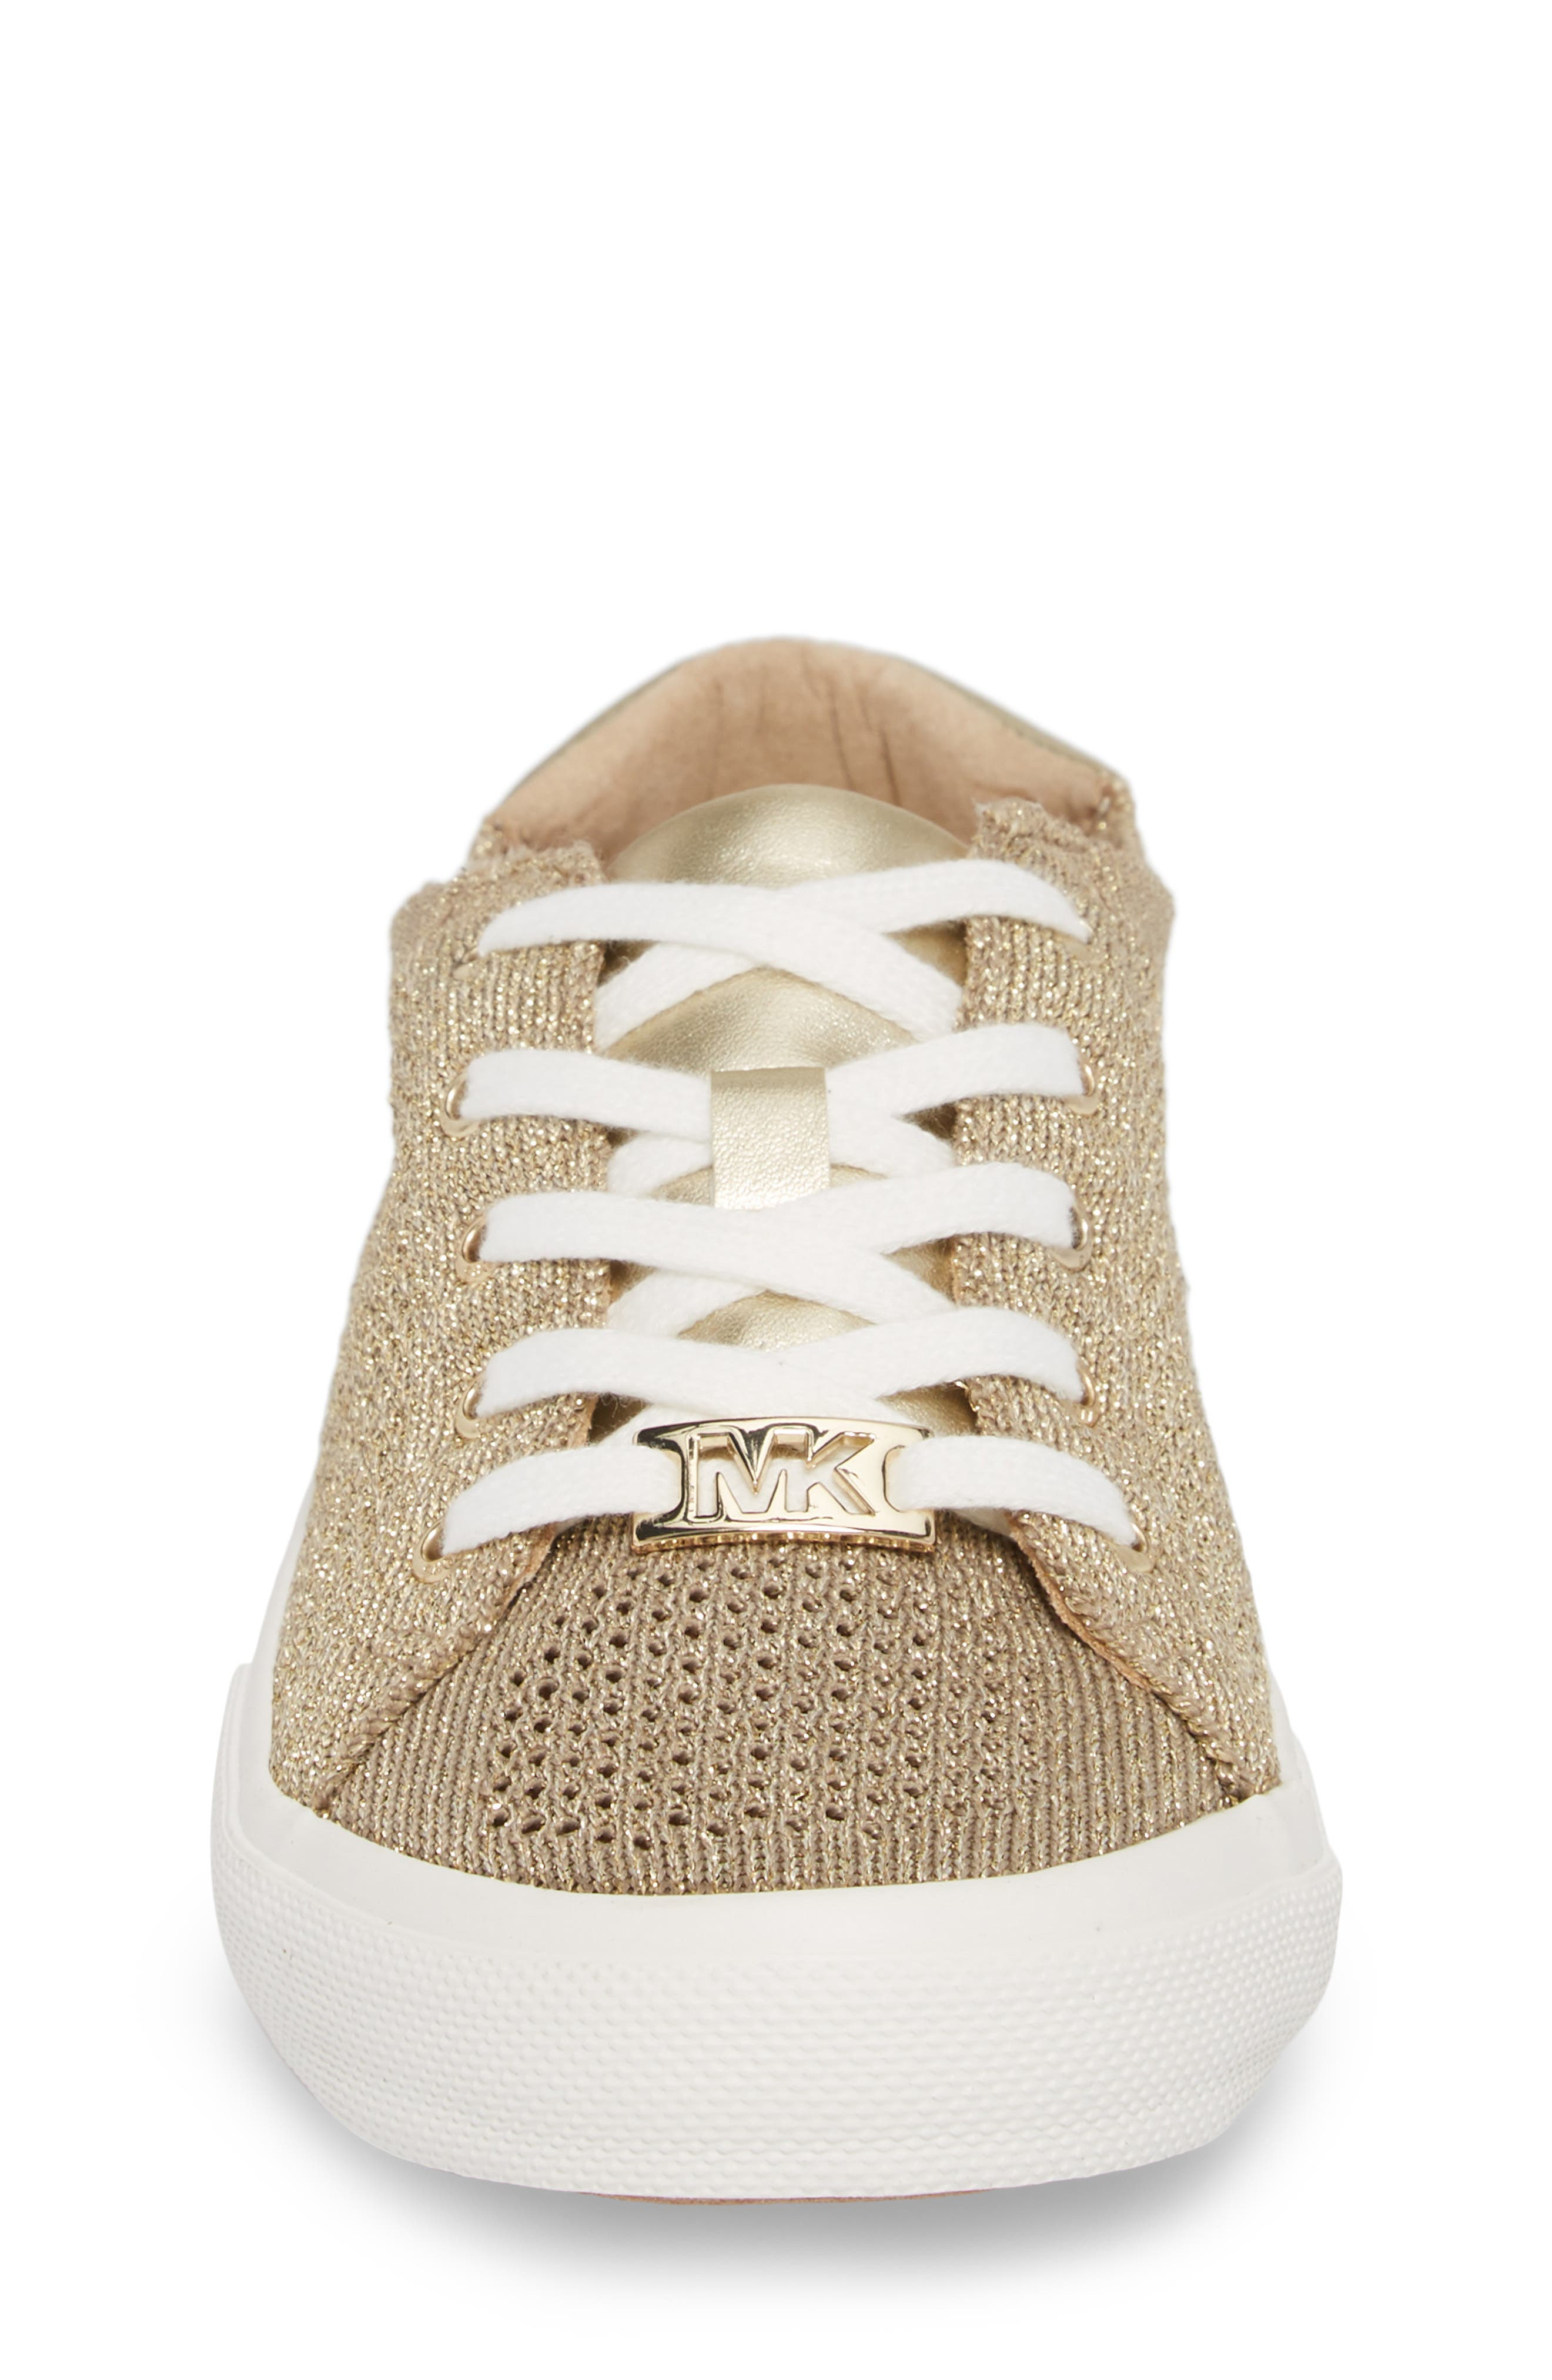 Ima Metallic Knit Sneaker,                             Alternate thumbnail 4, color,                             GOLD